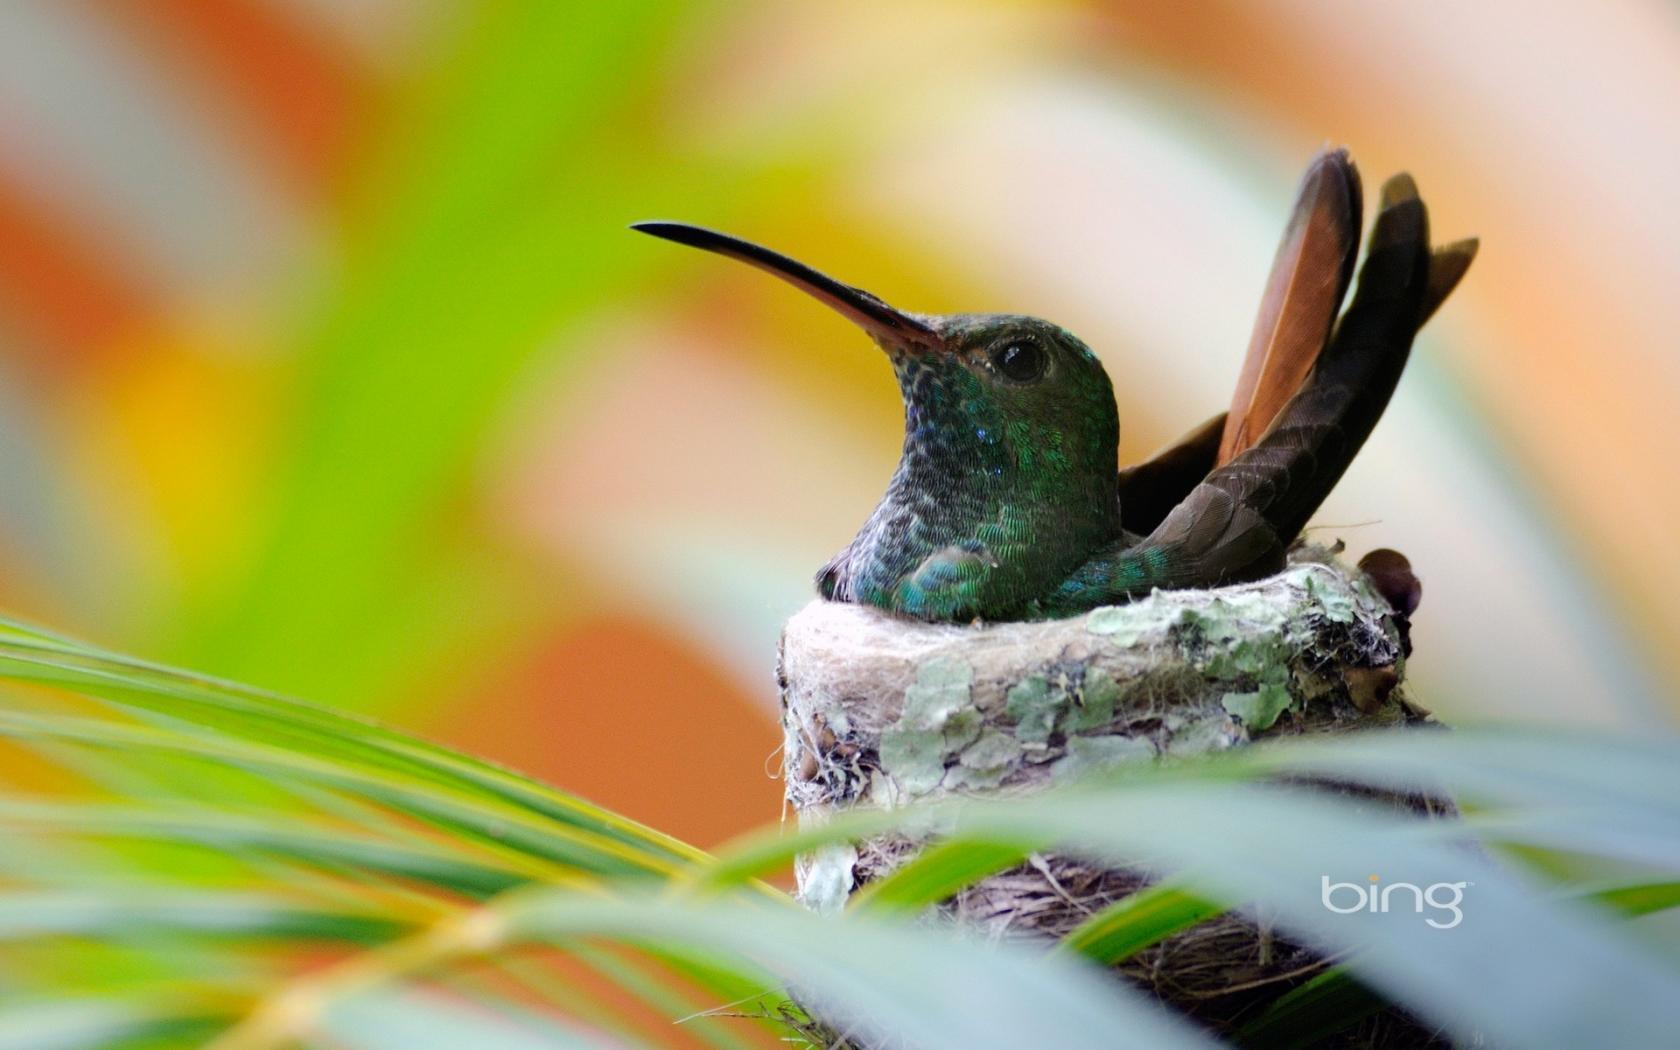 Bing birds hummingbirds leaves nature wallpaper 85567 1680x1050